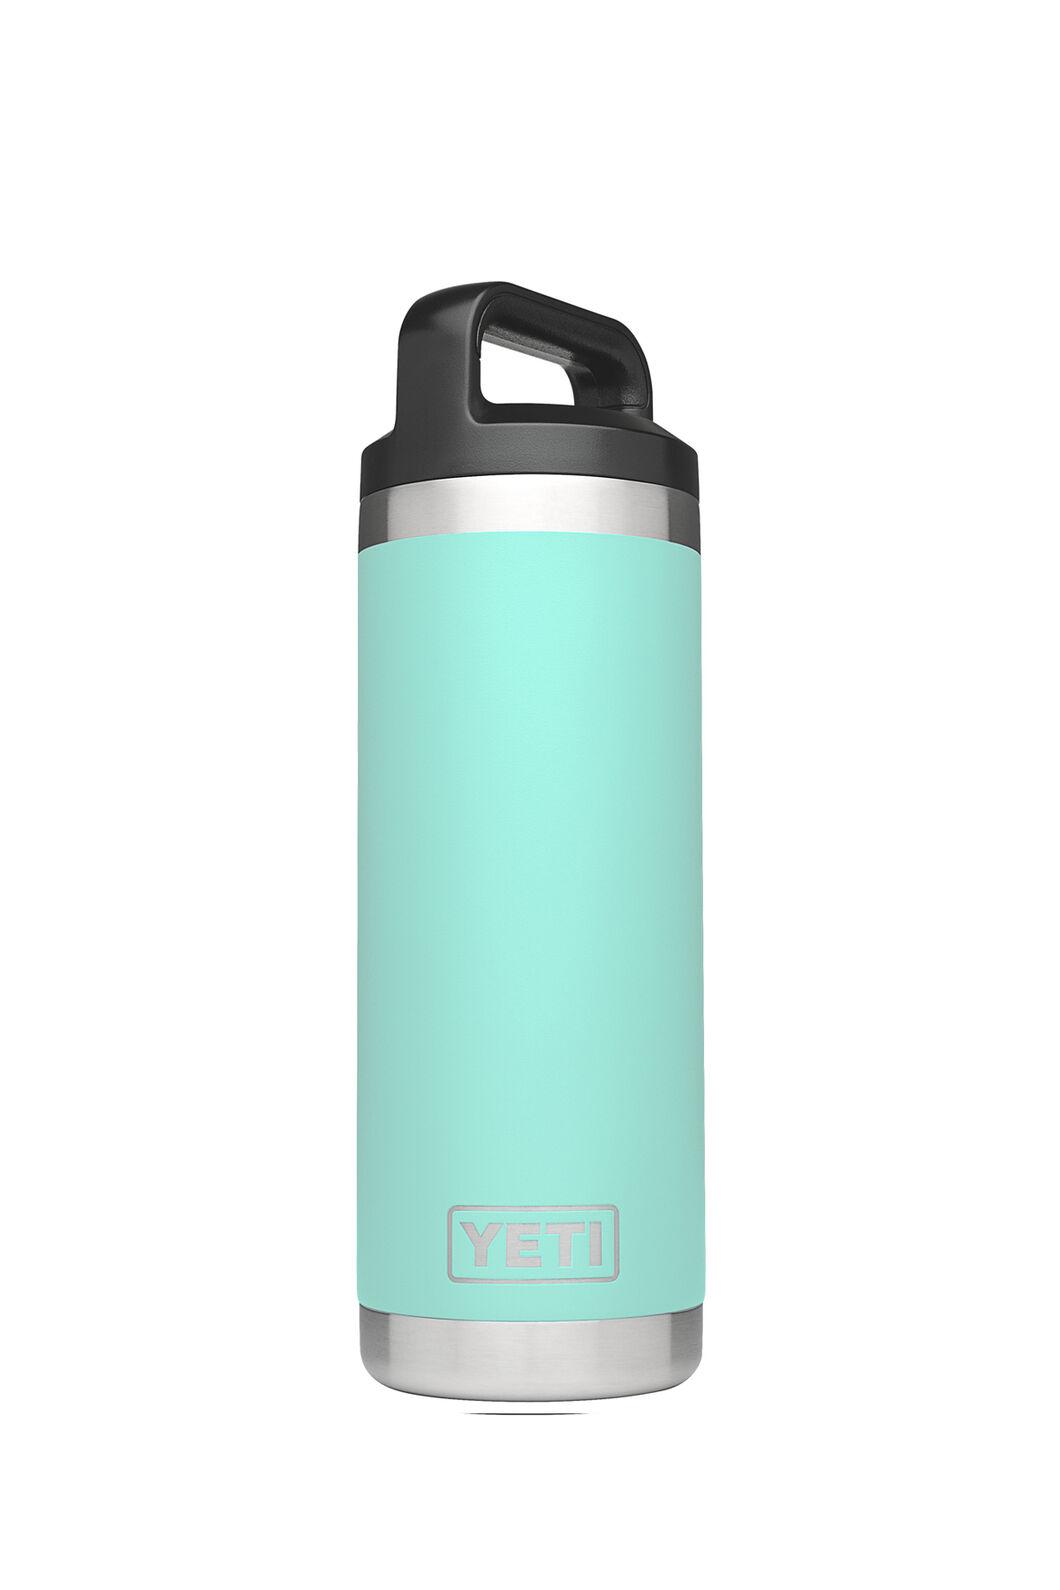 Yeti Rambler Drink Bottle Stainless Steel 18oz, SEAFOAM, hi-res